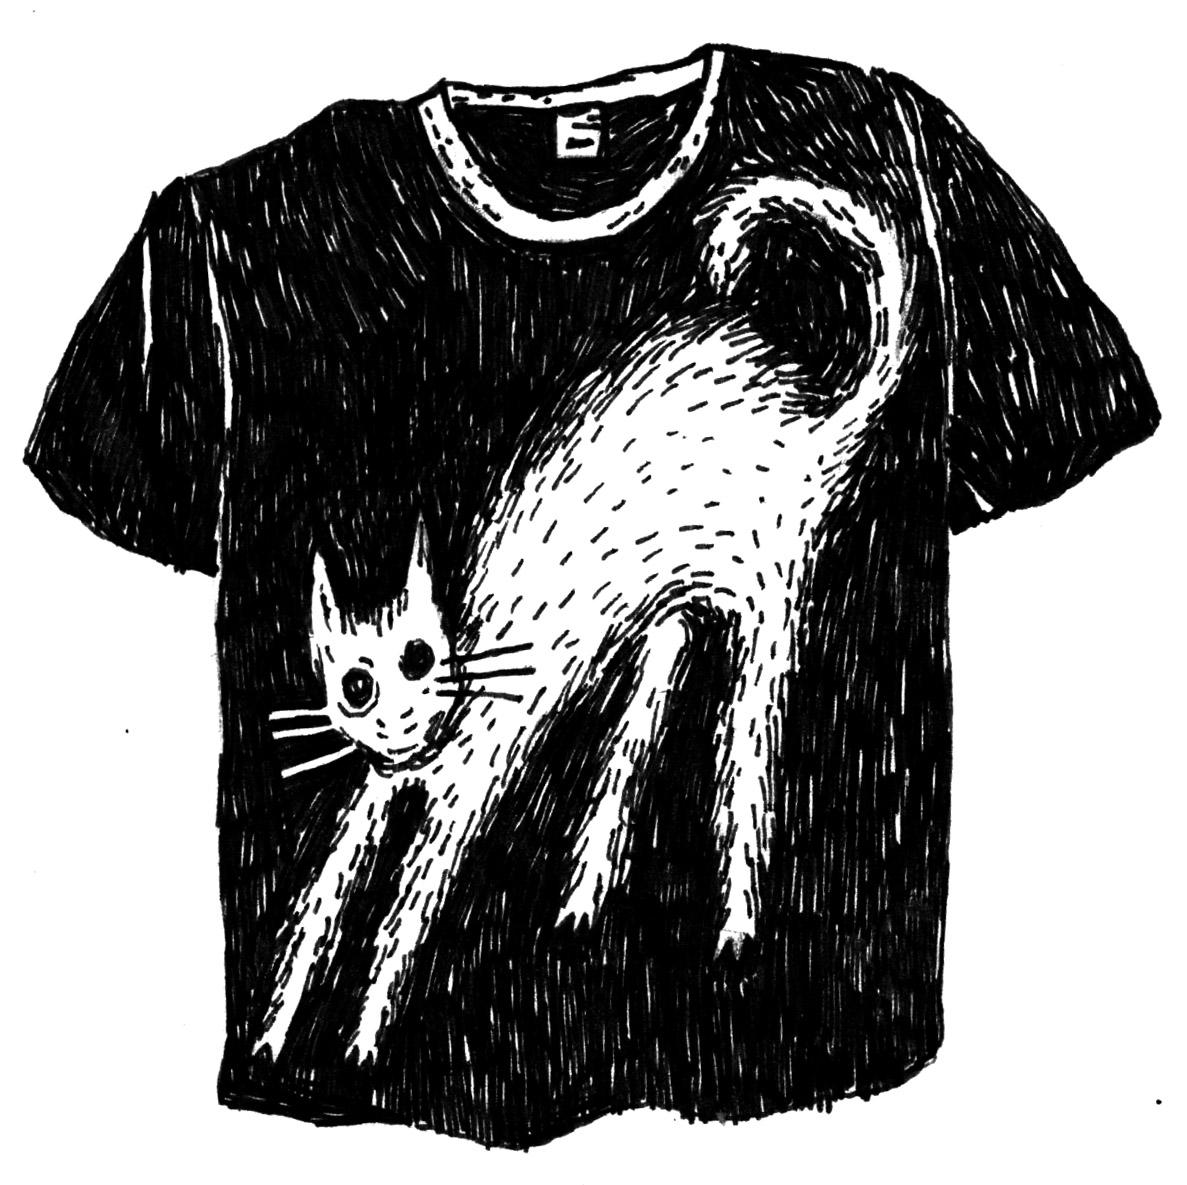 Tričko s kočkou (Kari)